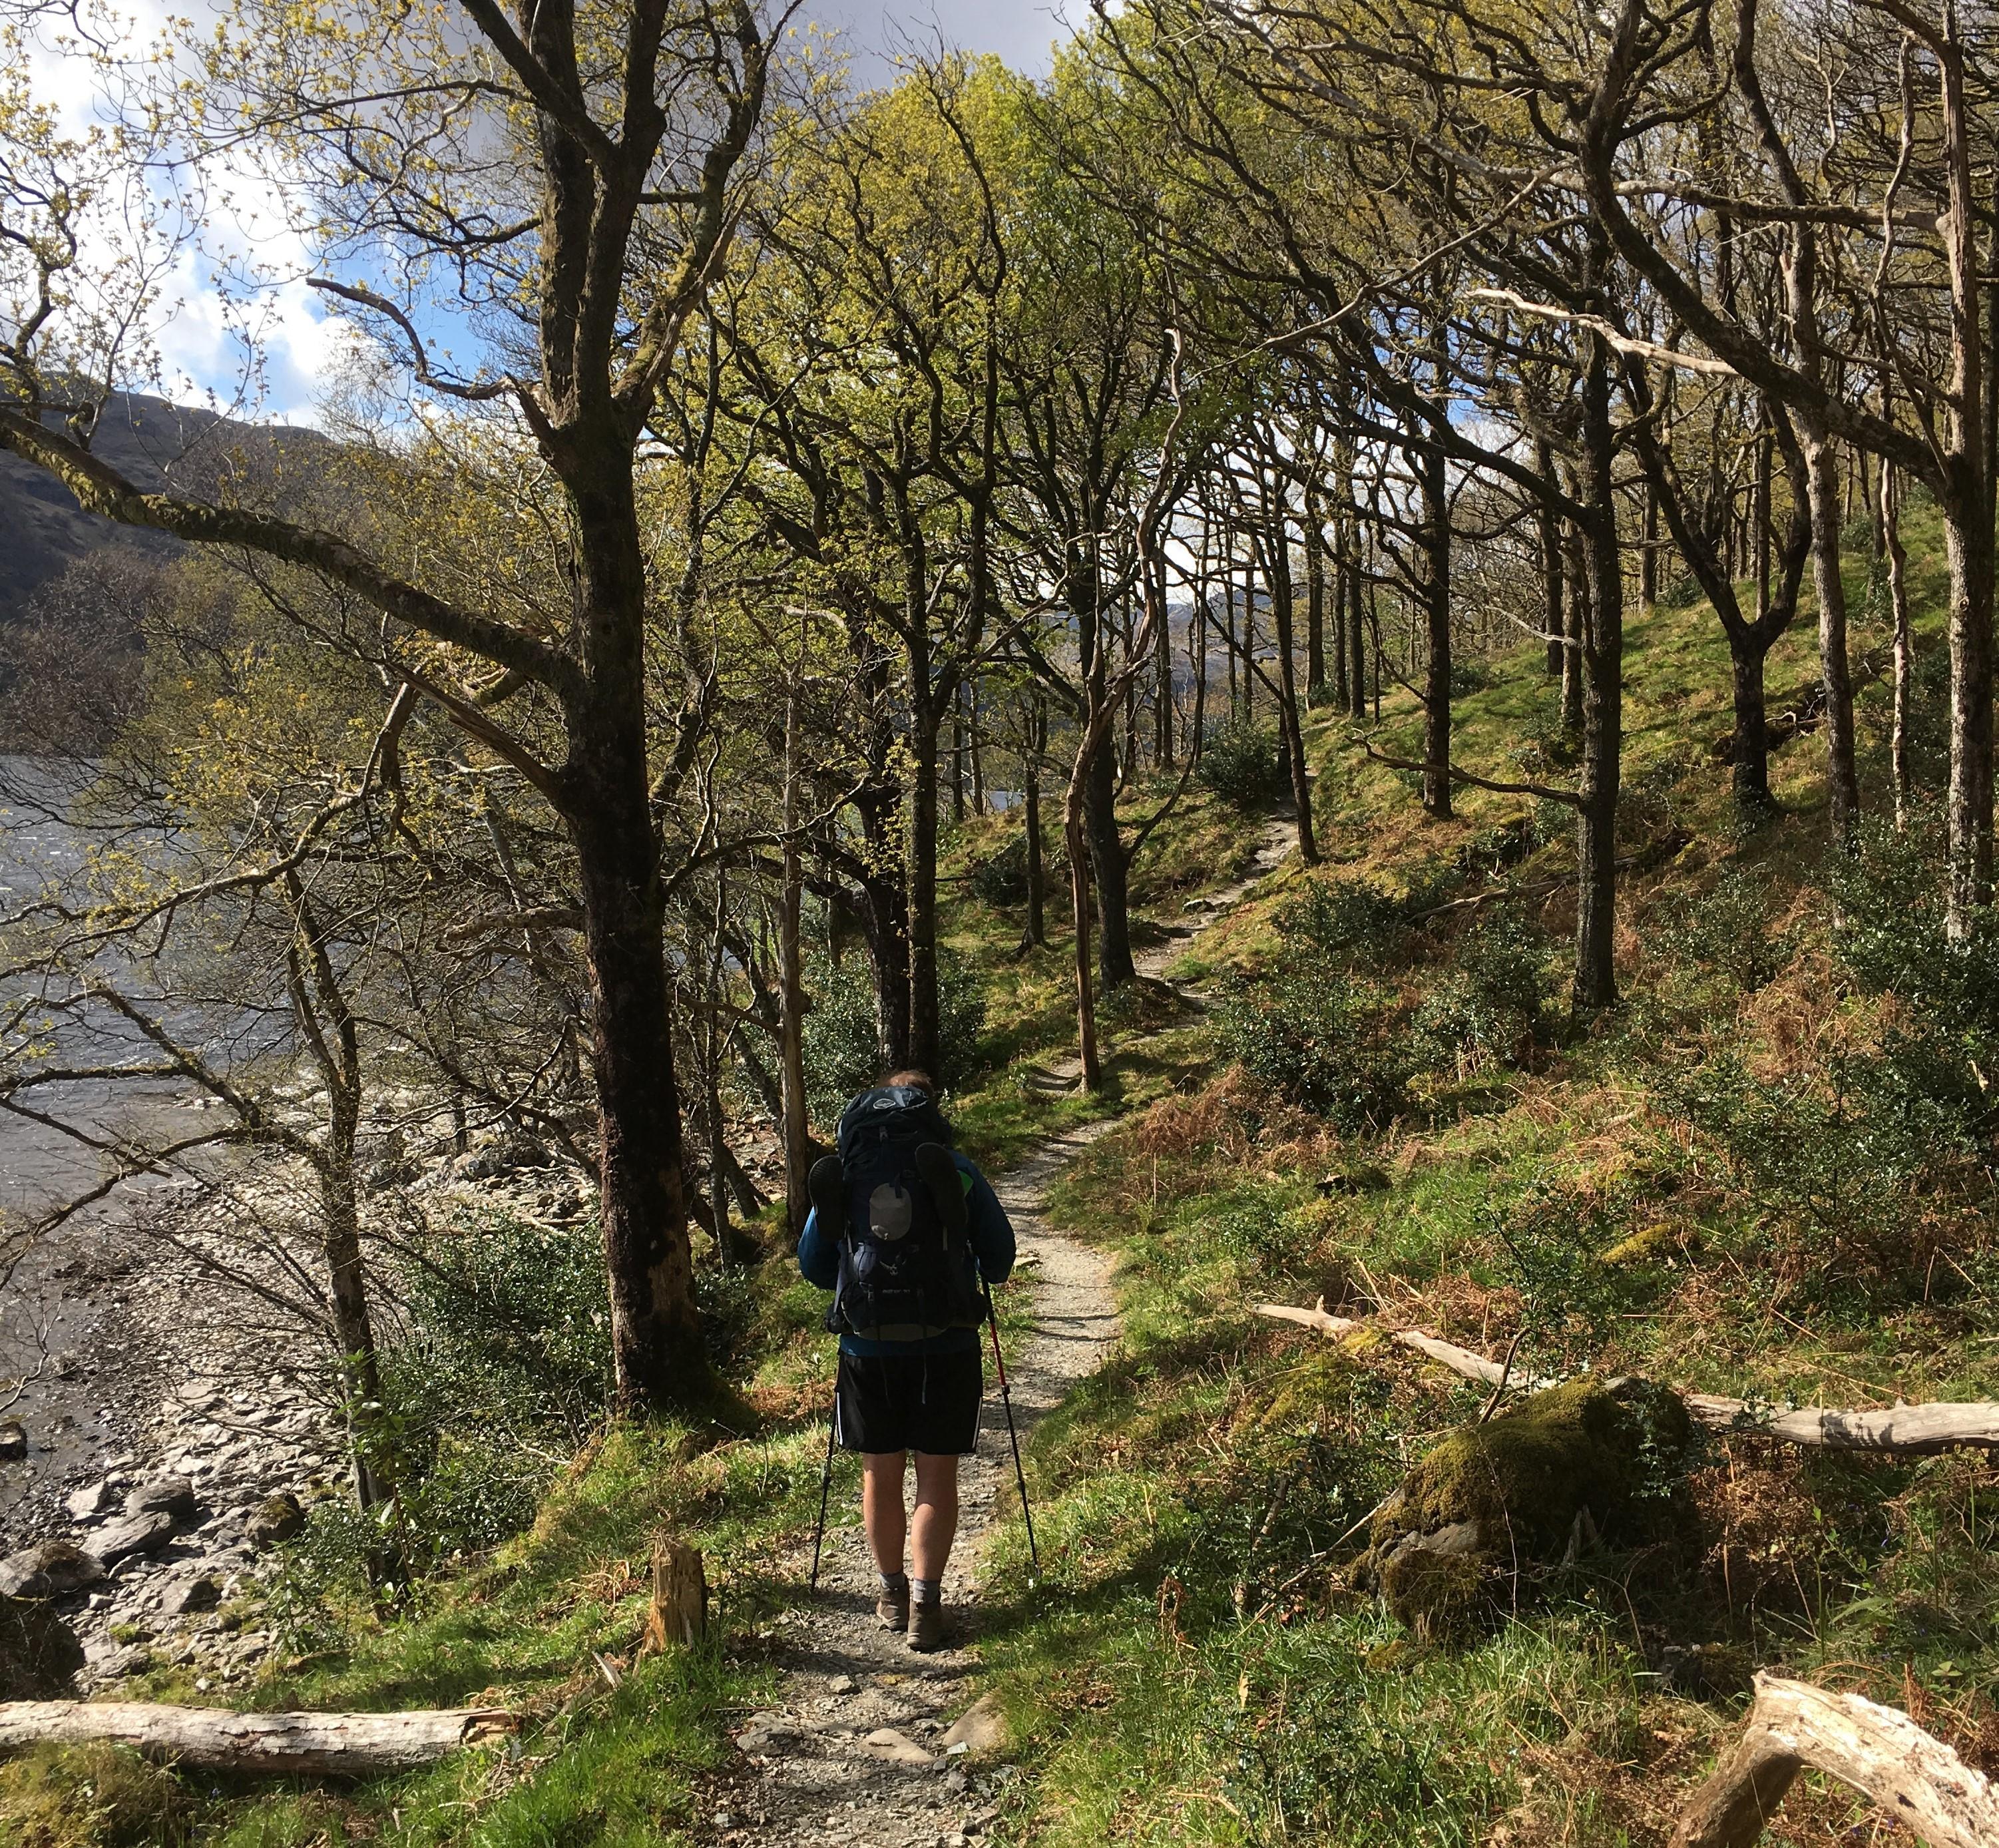 Walking along a rocky path